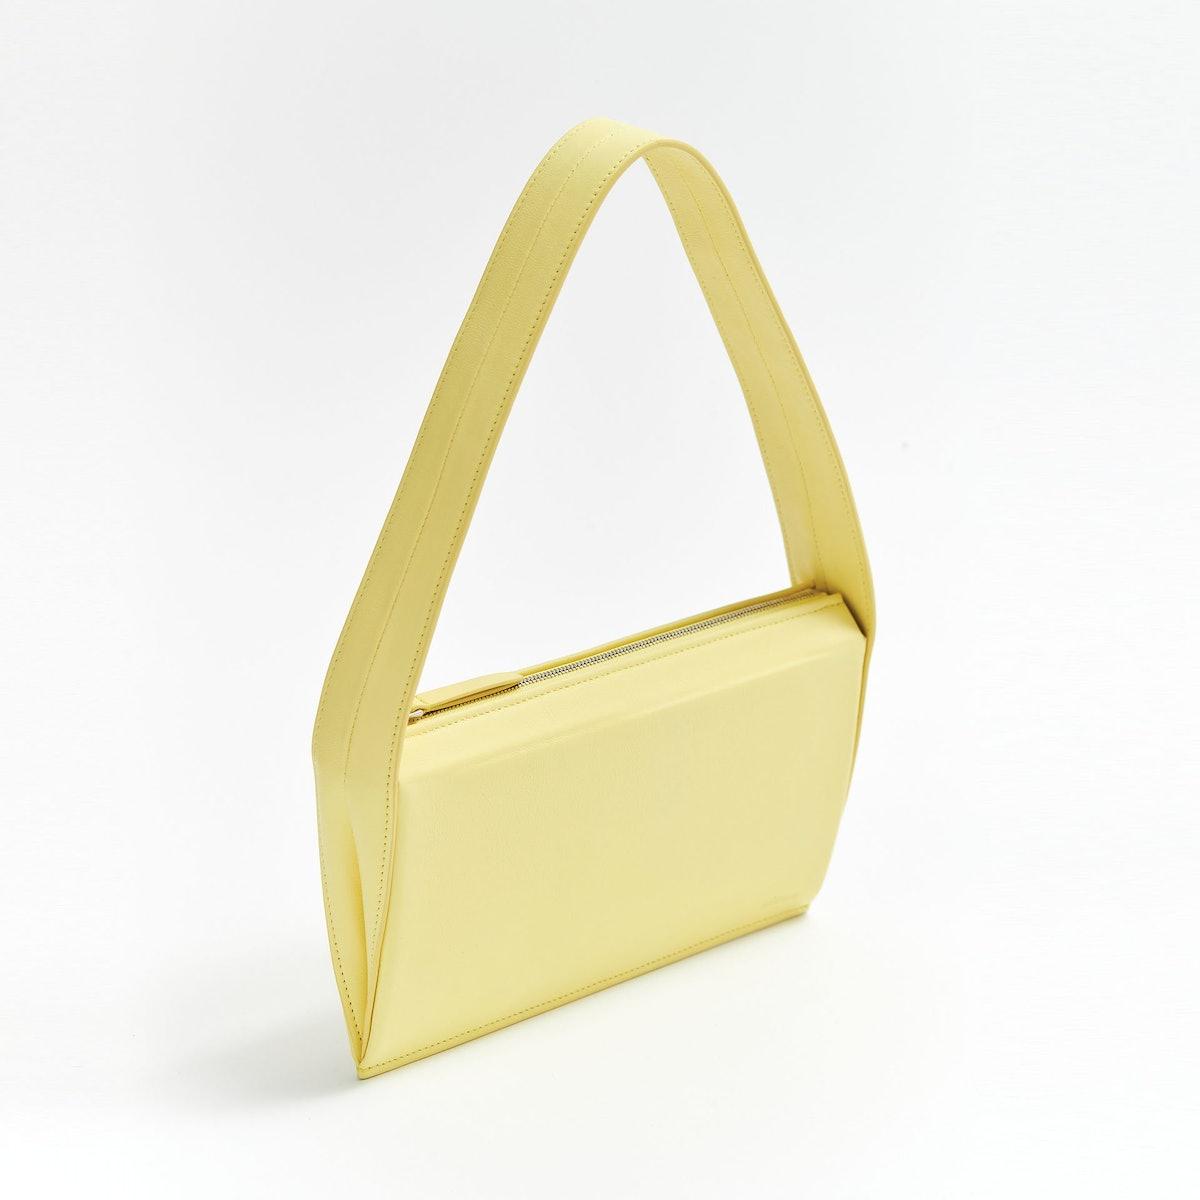 Advene Edge Bag